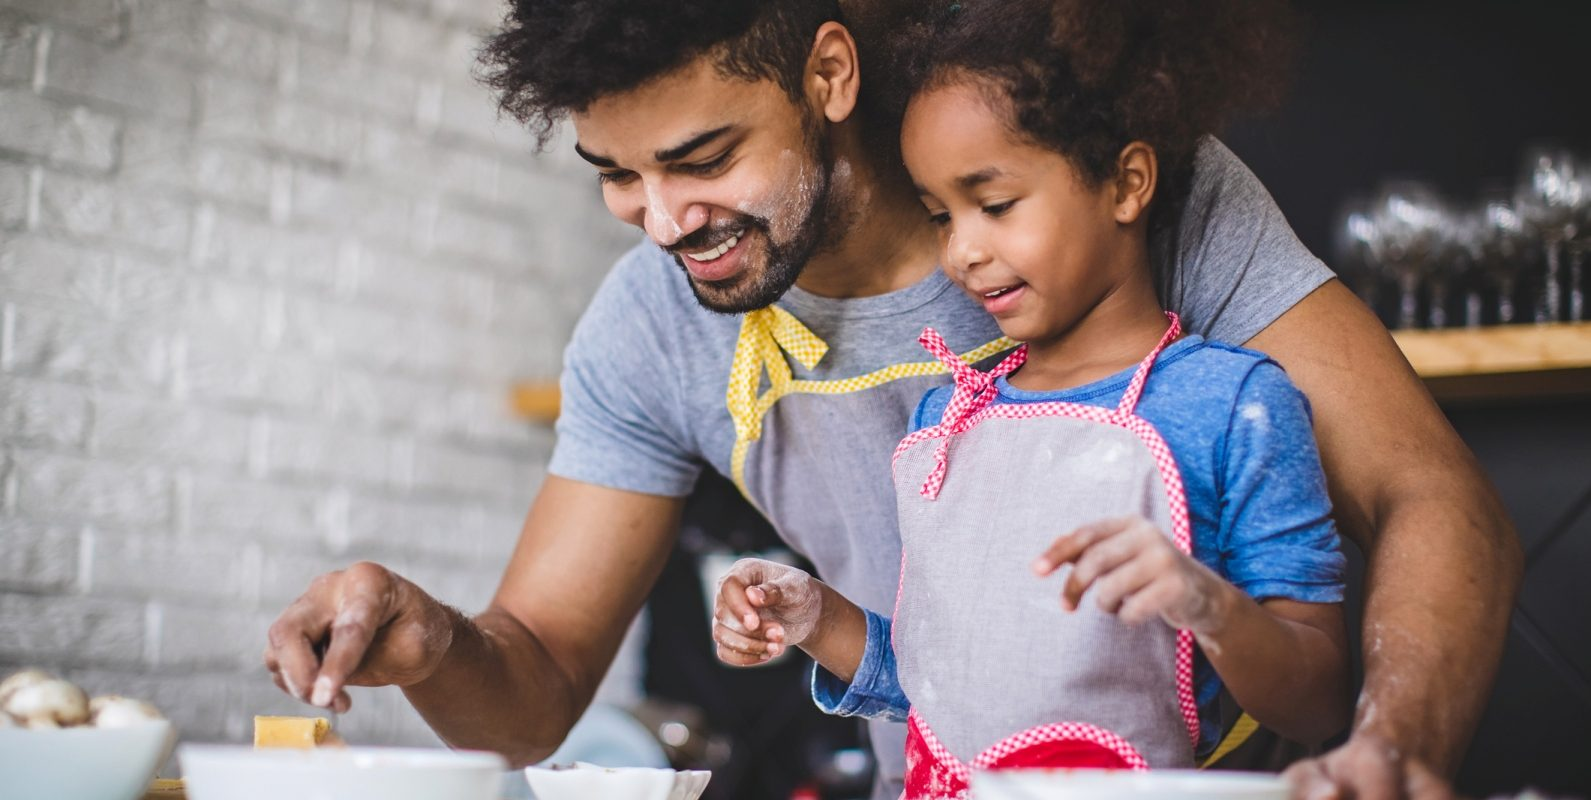 Kids in the Kitchen, Powered by Nemours Children's Health System